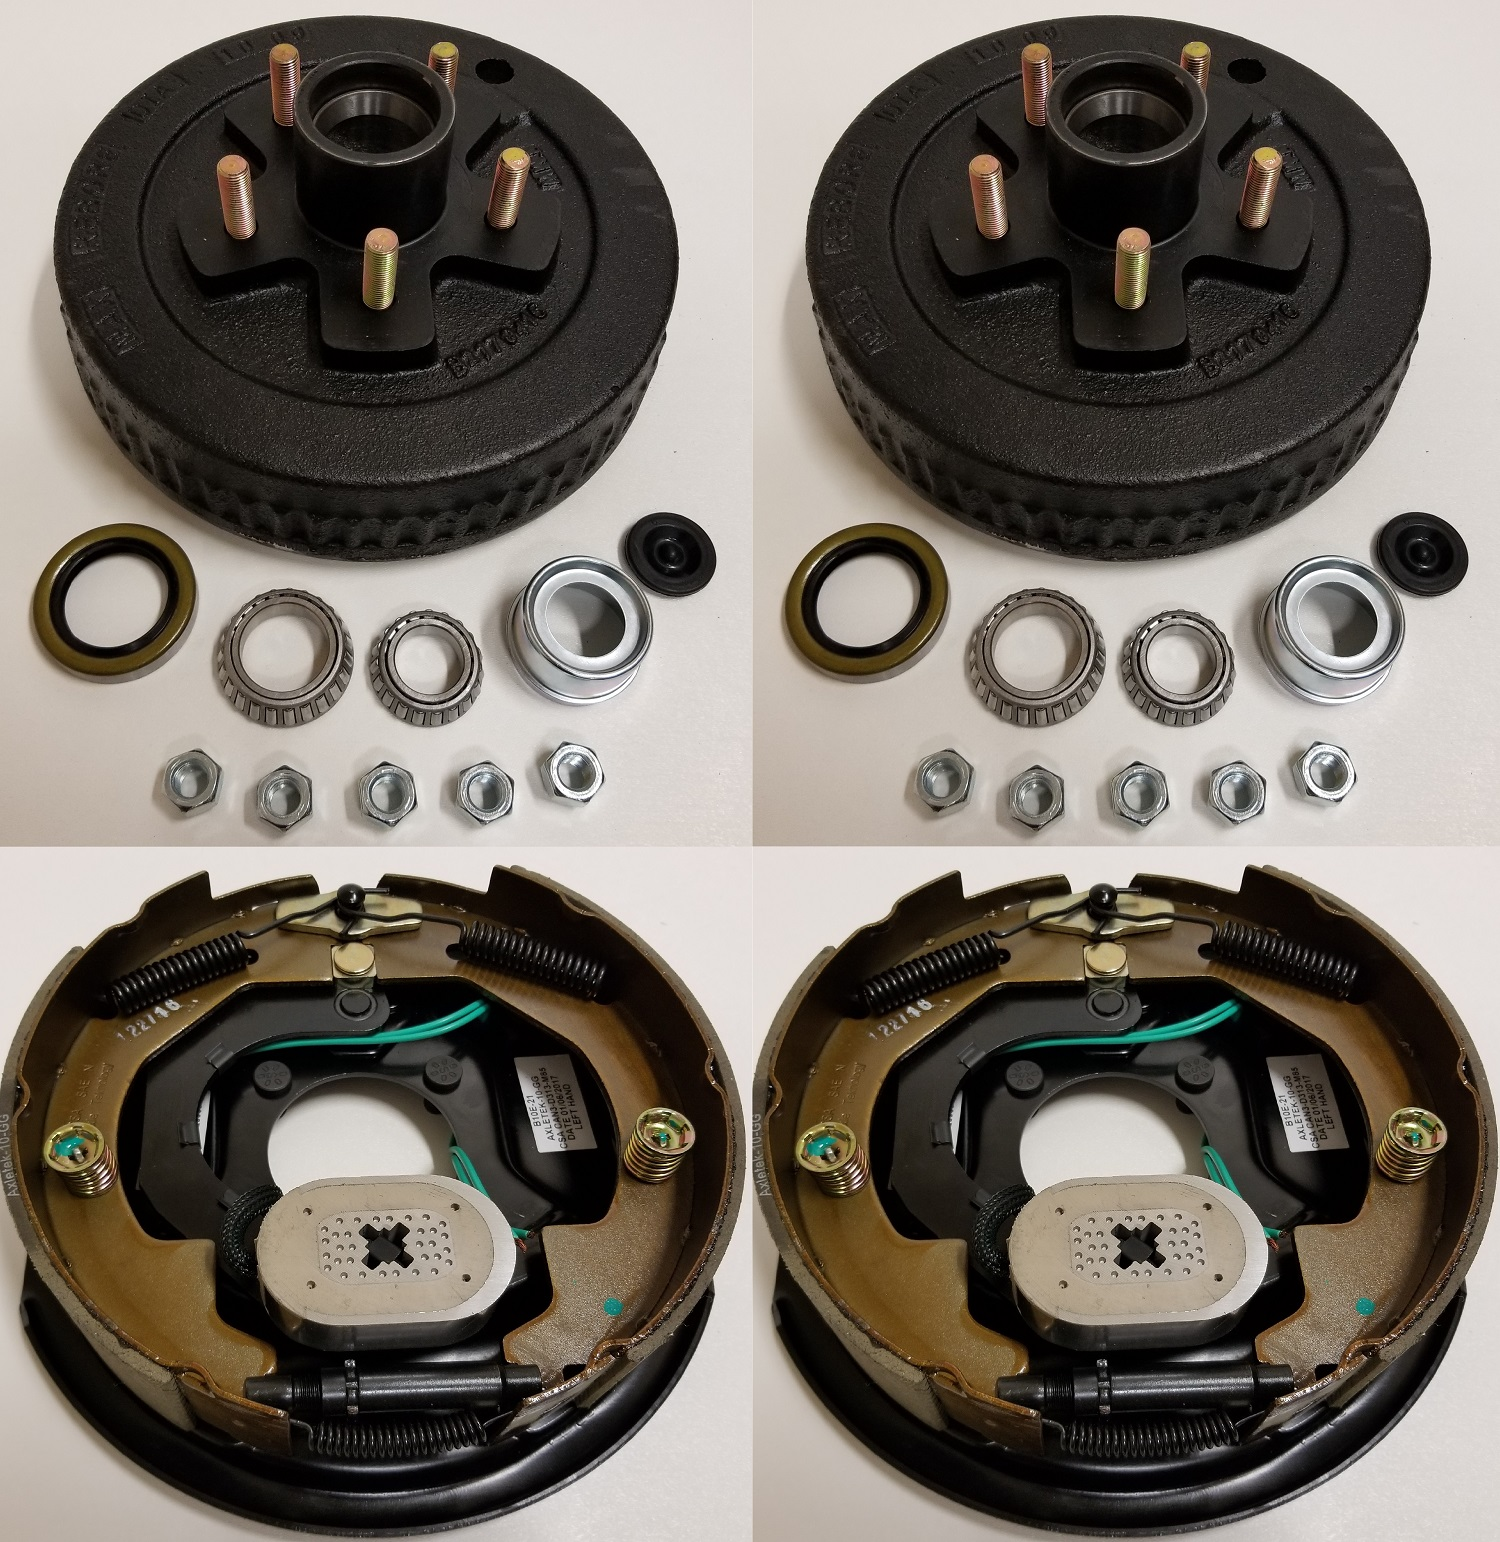 2-Pk Electric Trailer Brake 10 inch LH Backing Plates Hub / Drum Kits (5 on 4.5)